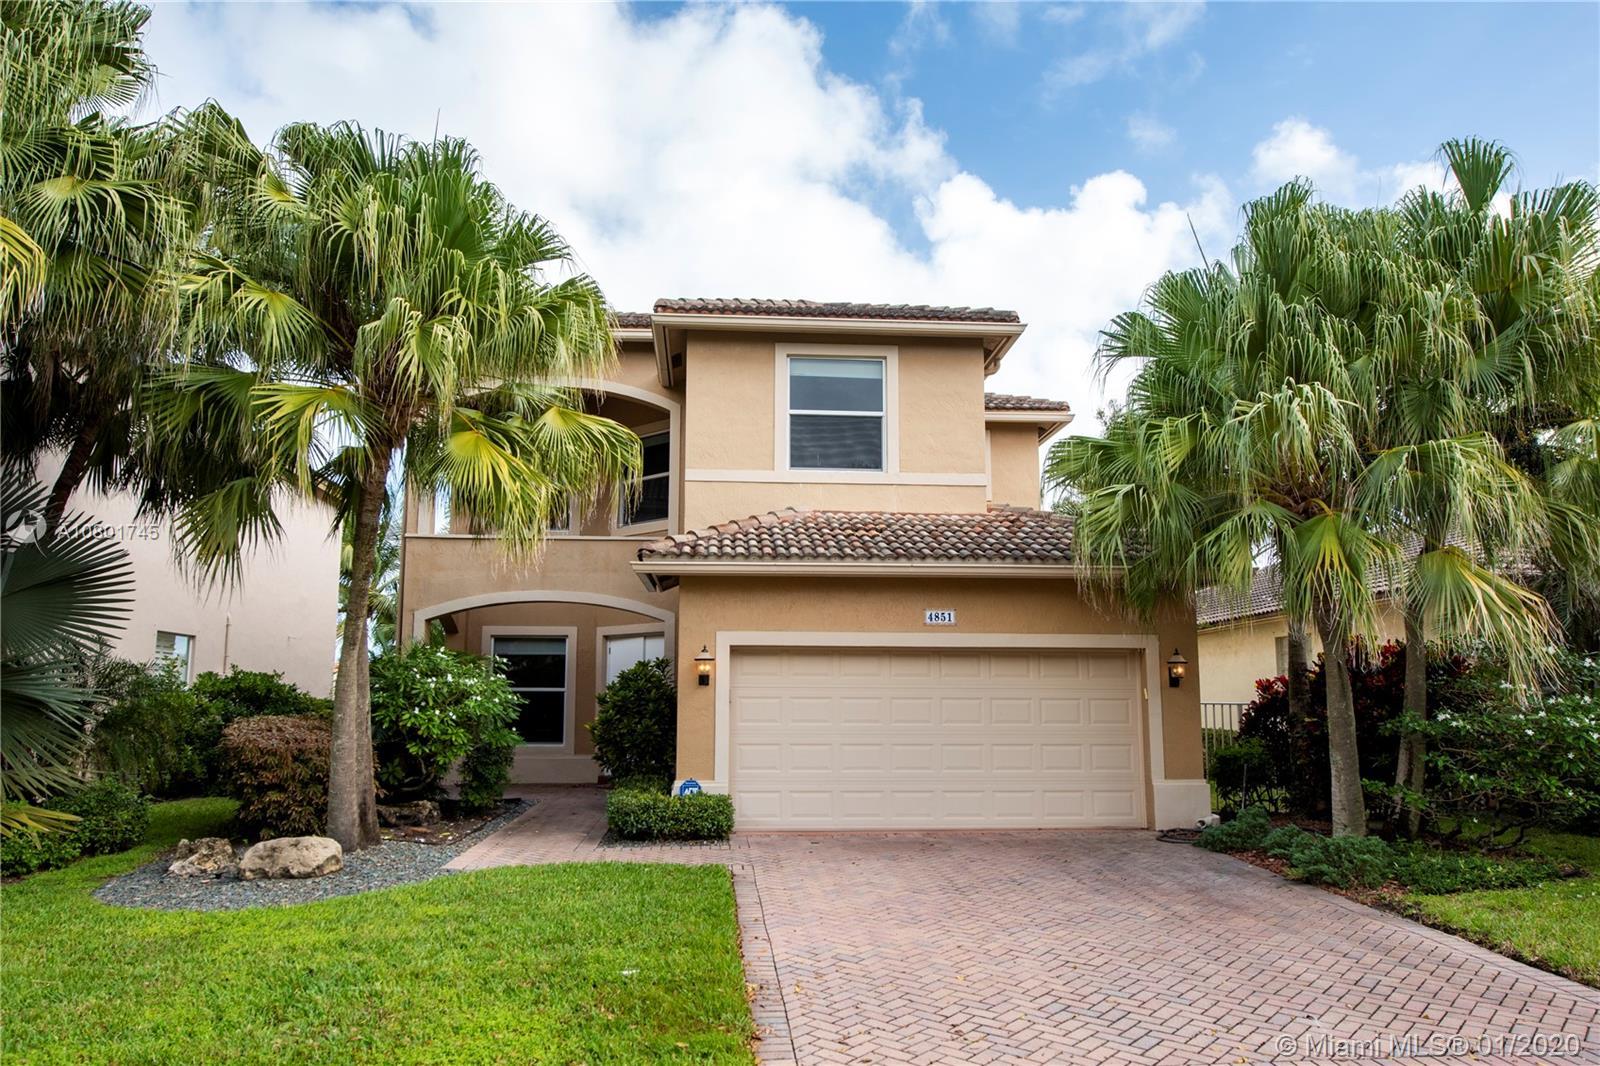 4851 Modern Dr, Delray Beach, FL 33445